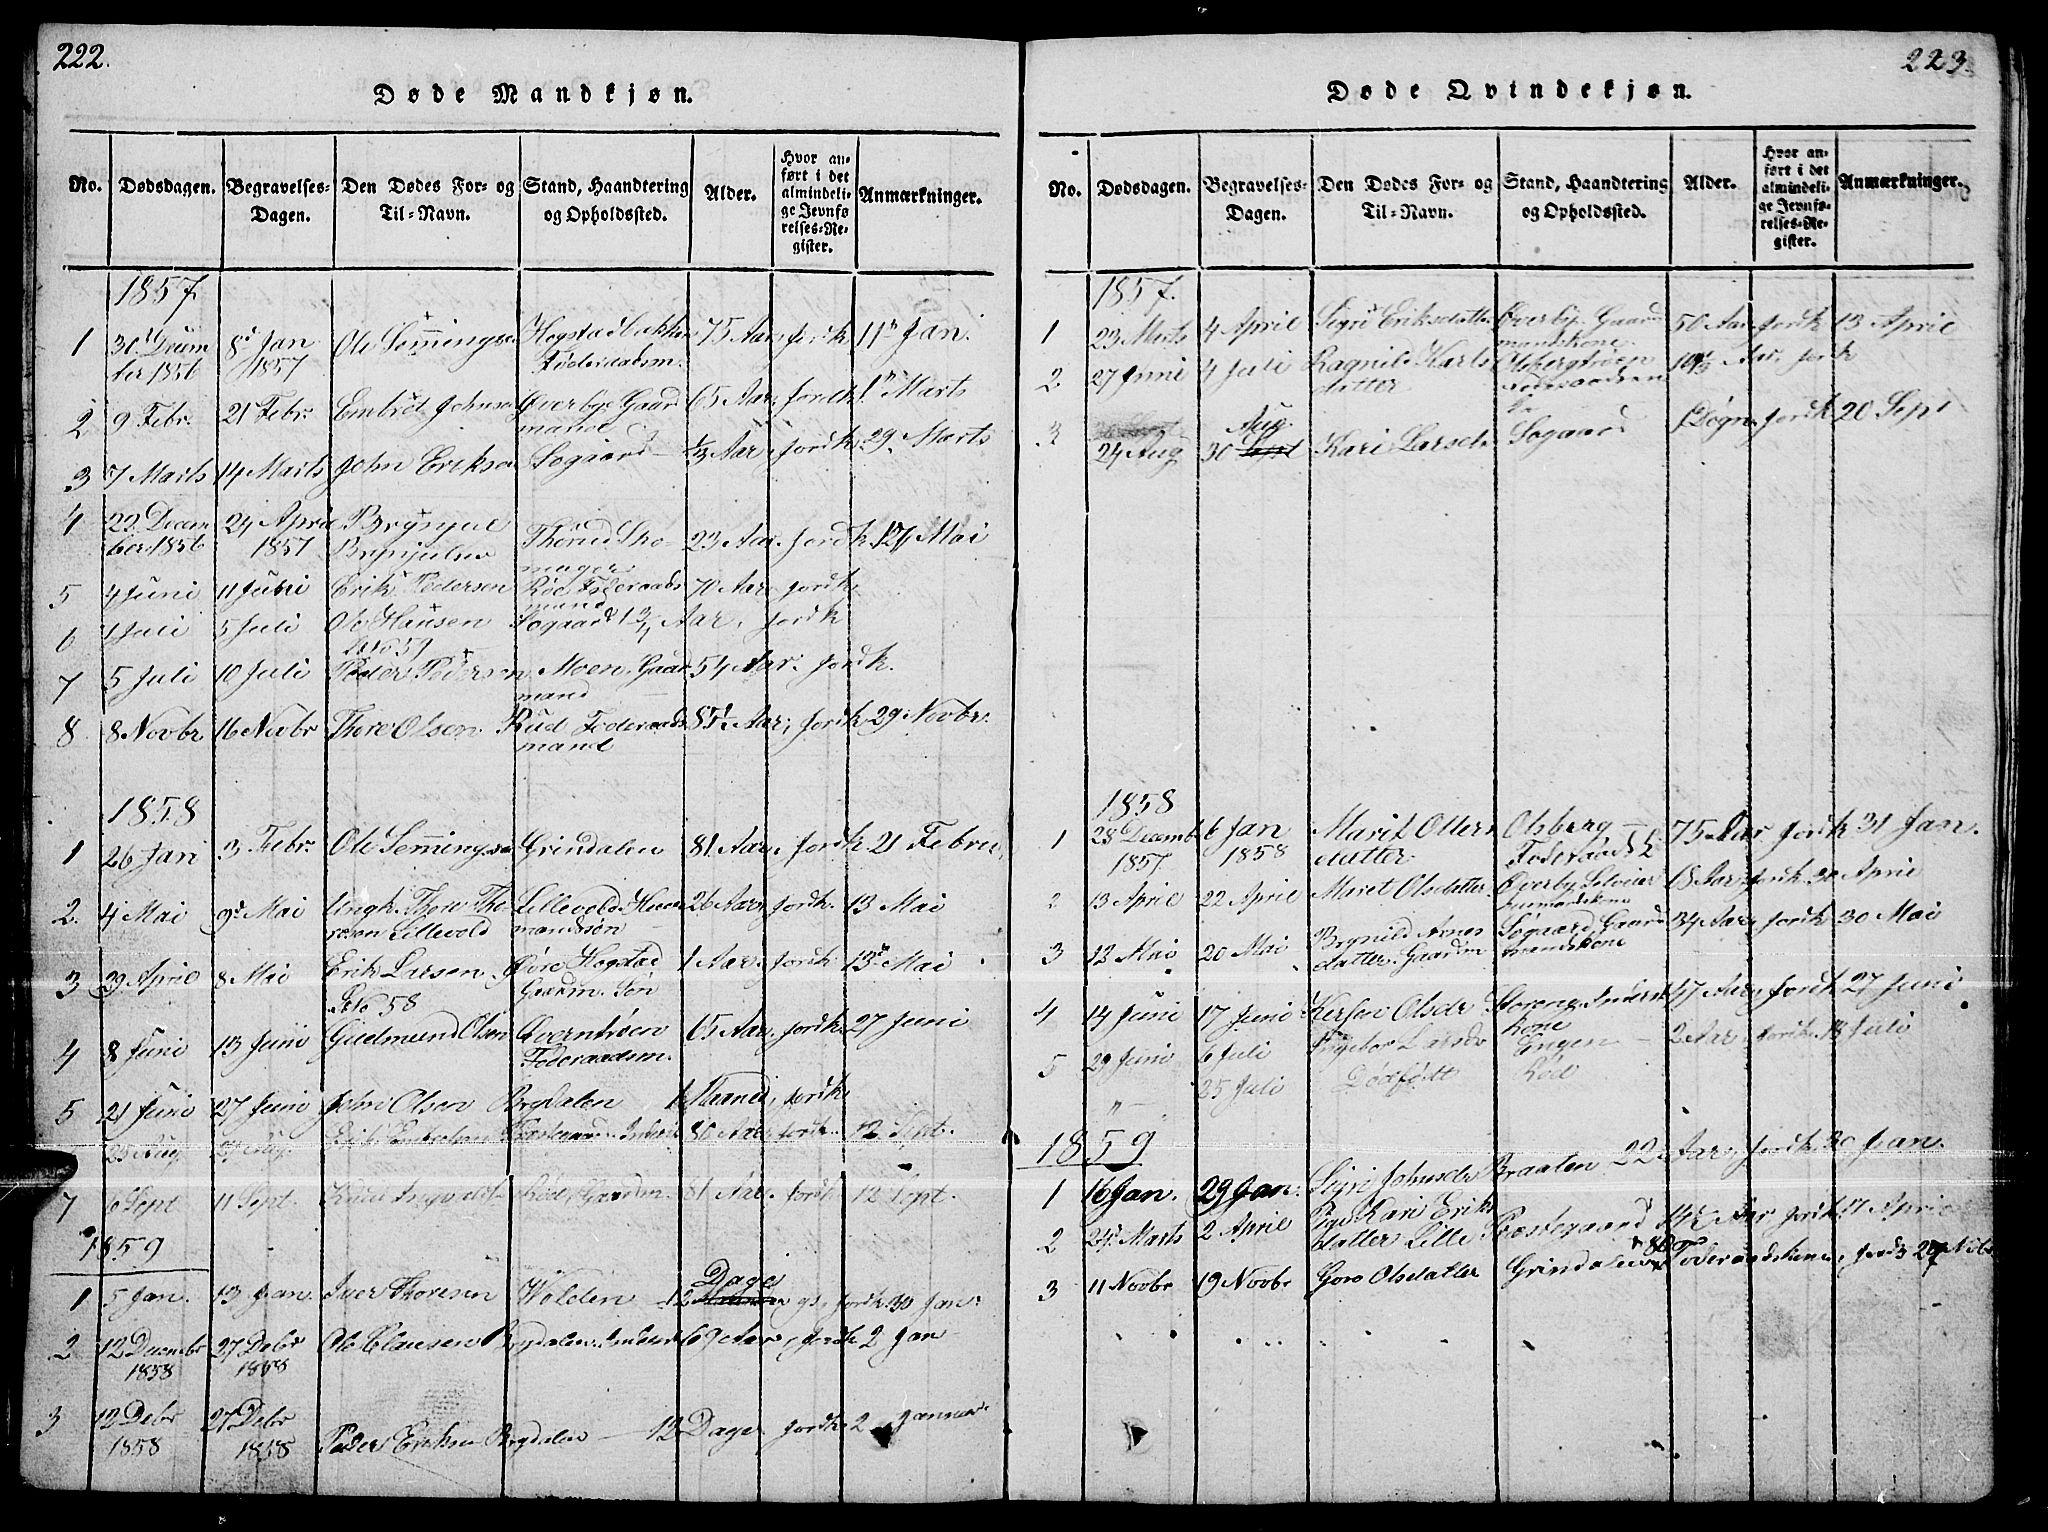 SAH, Tynset prestekontor, Parish register (copy) no. 4, 1814-1879, p. 222-223